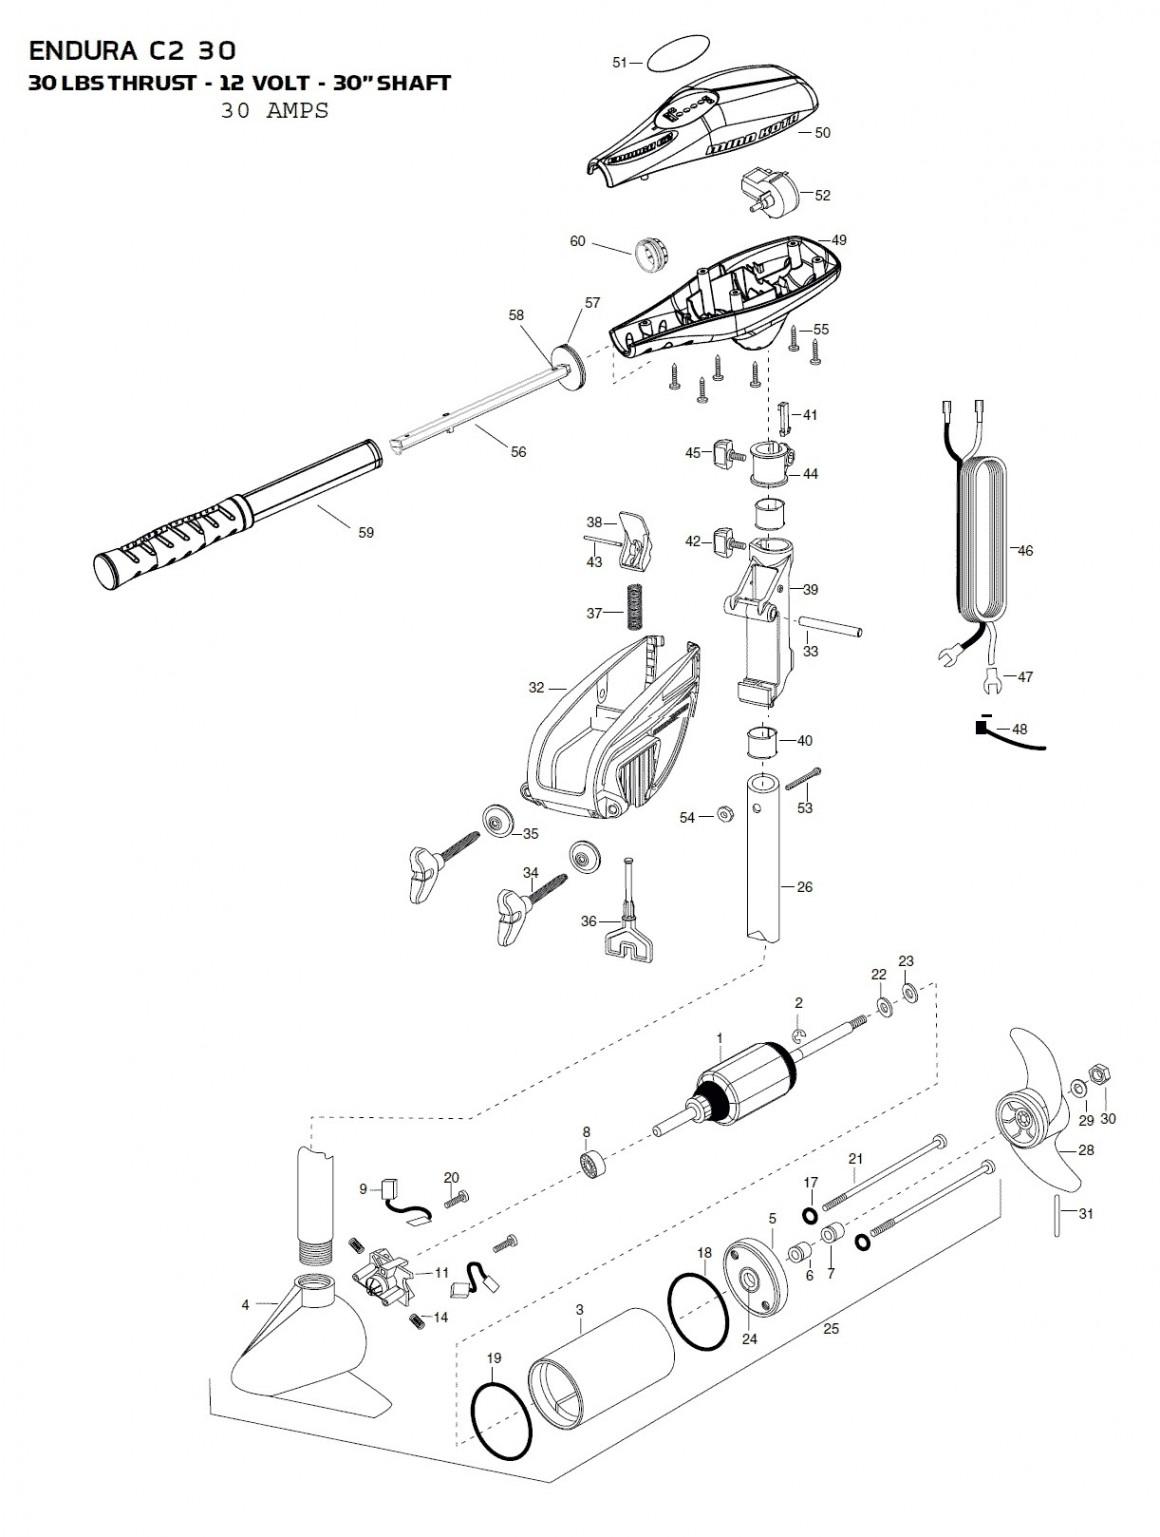 minn kota riptide wiring diagram Collection-Minn Kota Parts Diagram 19-t